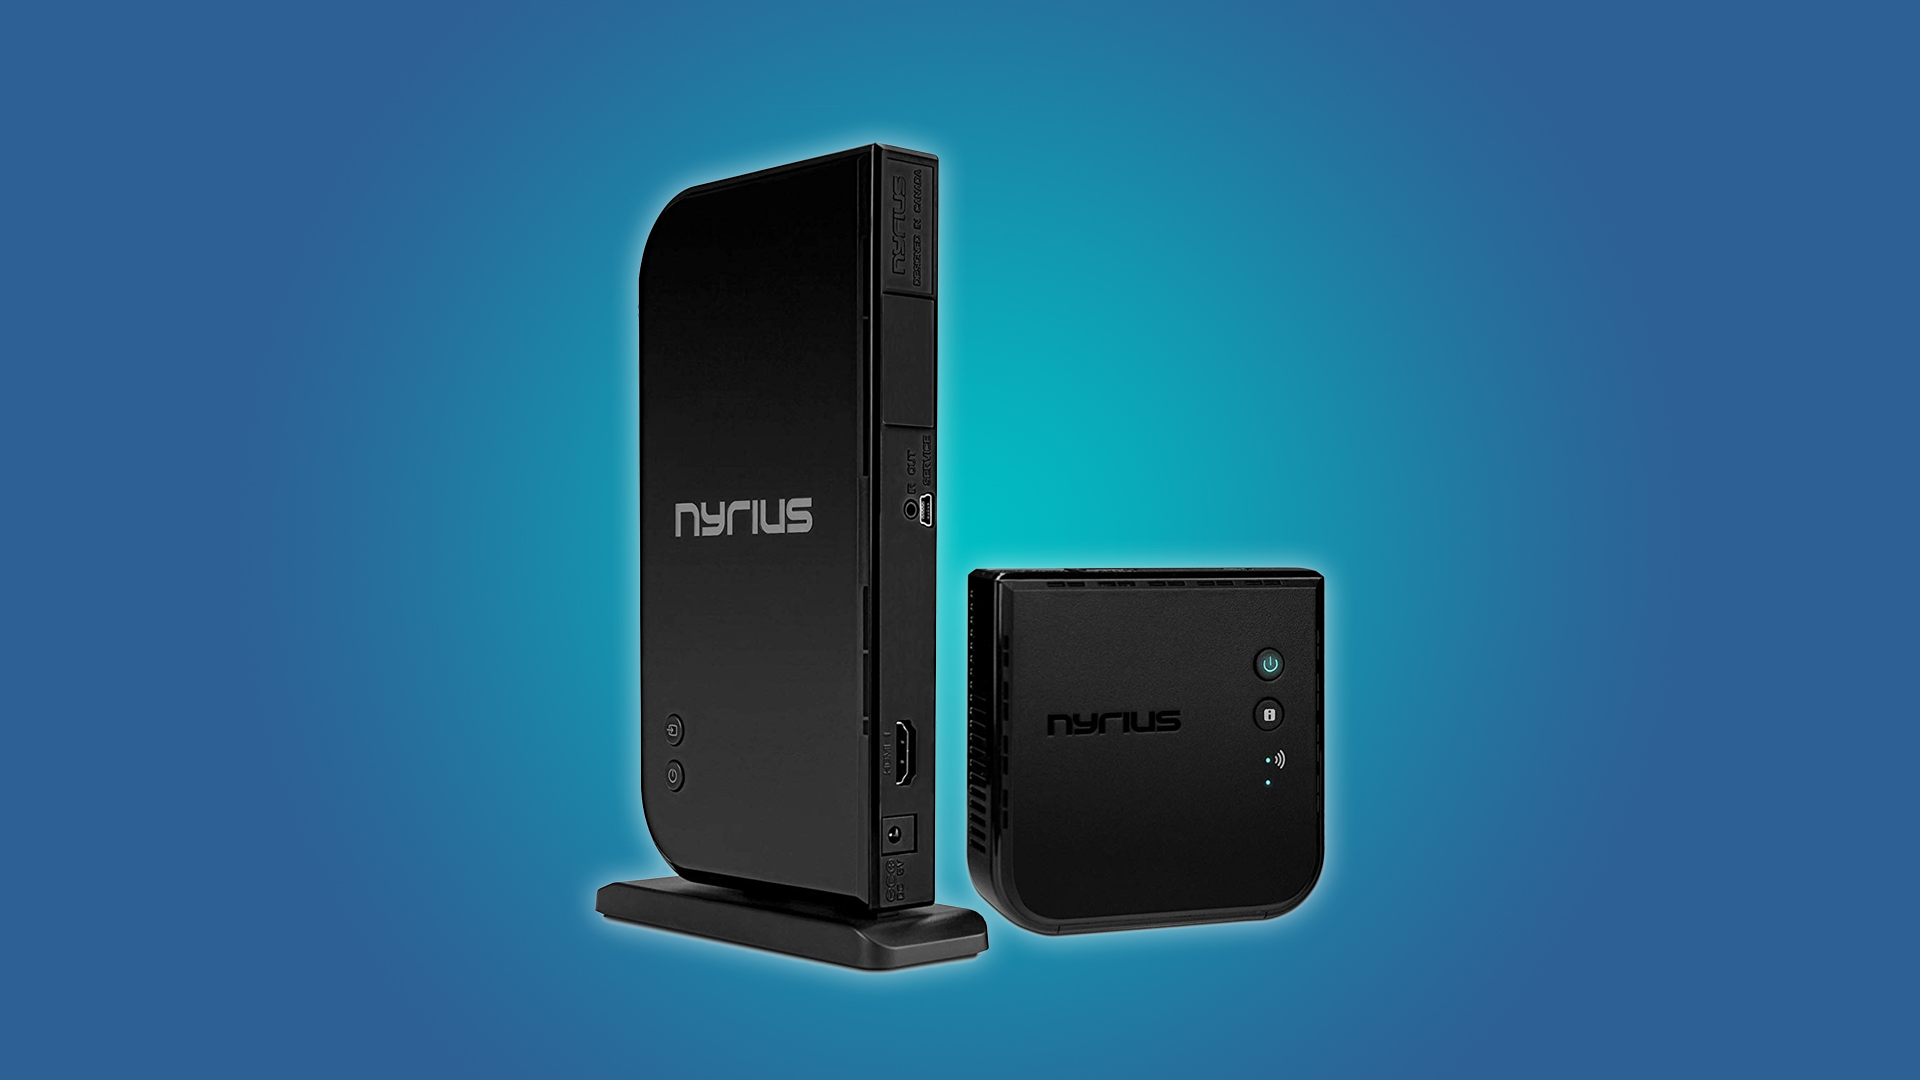 The Nyrius ARIES NAVS500 transmitter and reciever